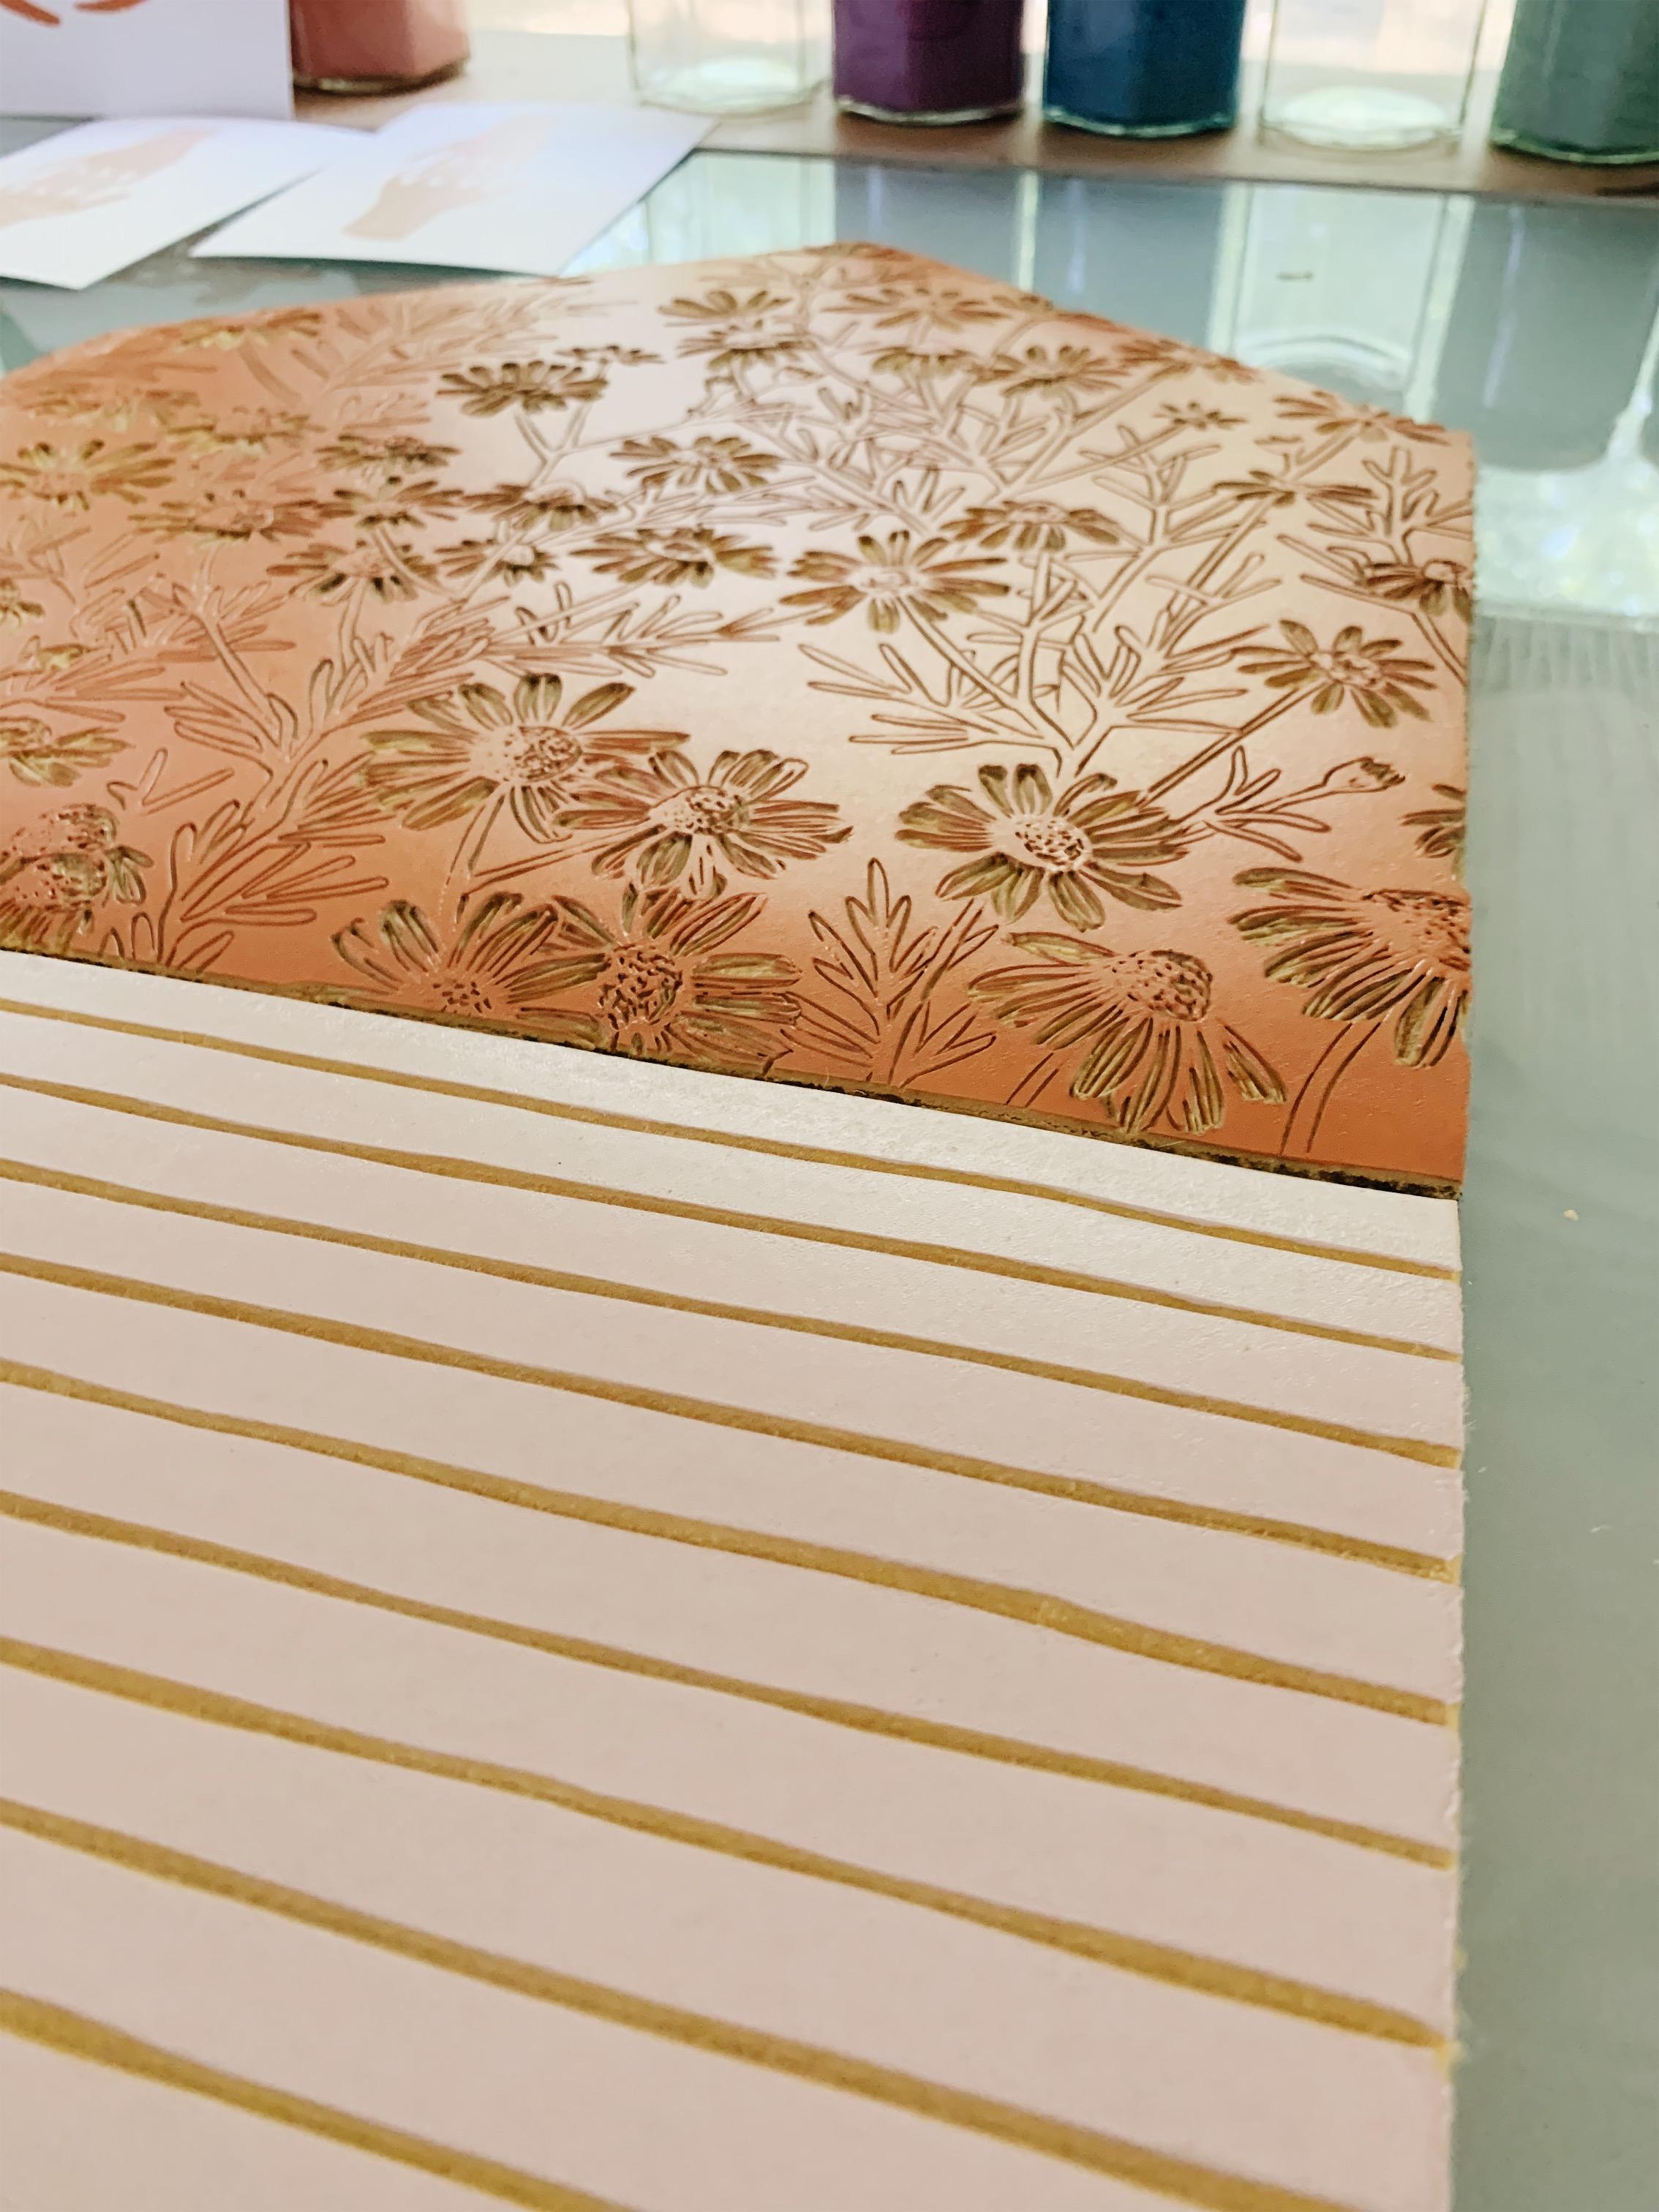 https://www.annatovar.com/linocut-prints/chamomile-terra-cotta